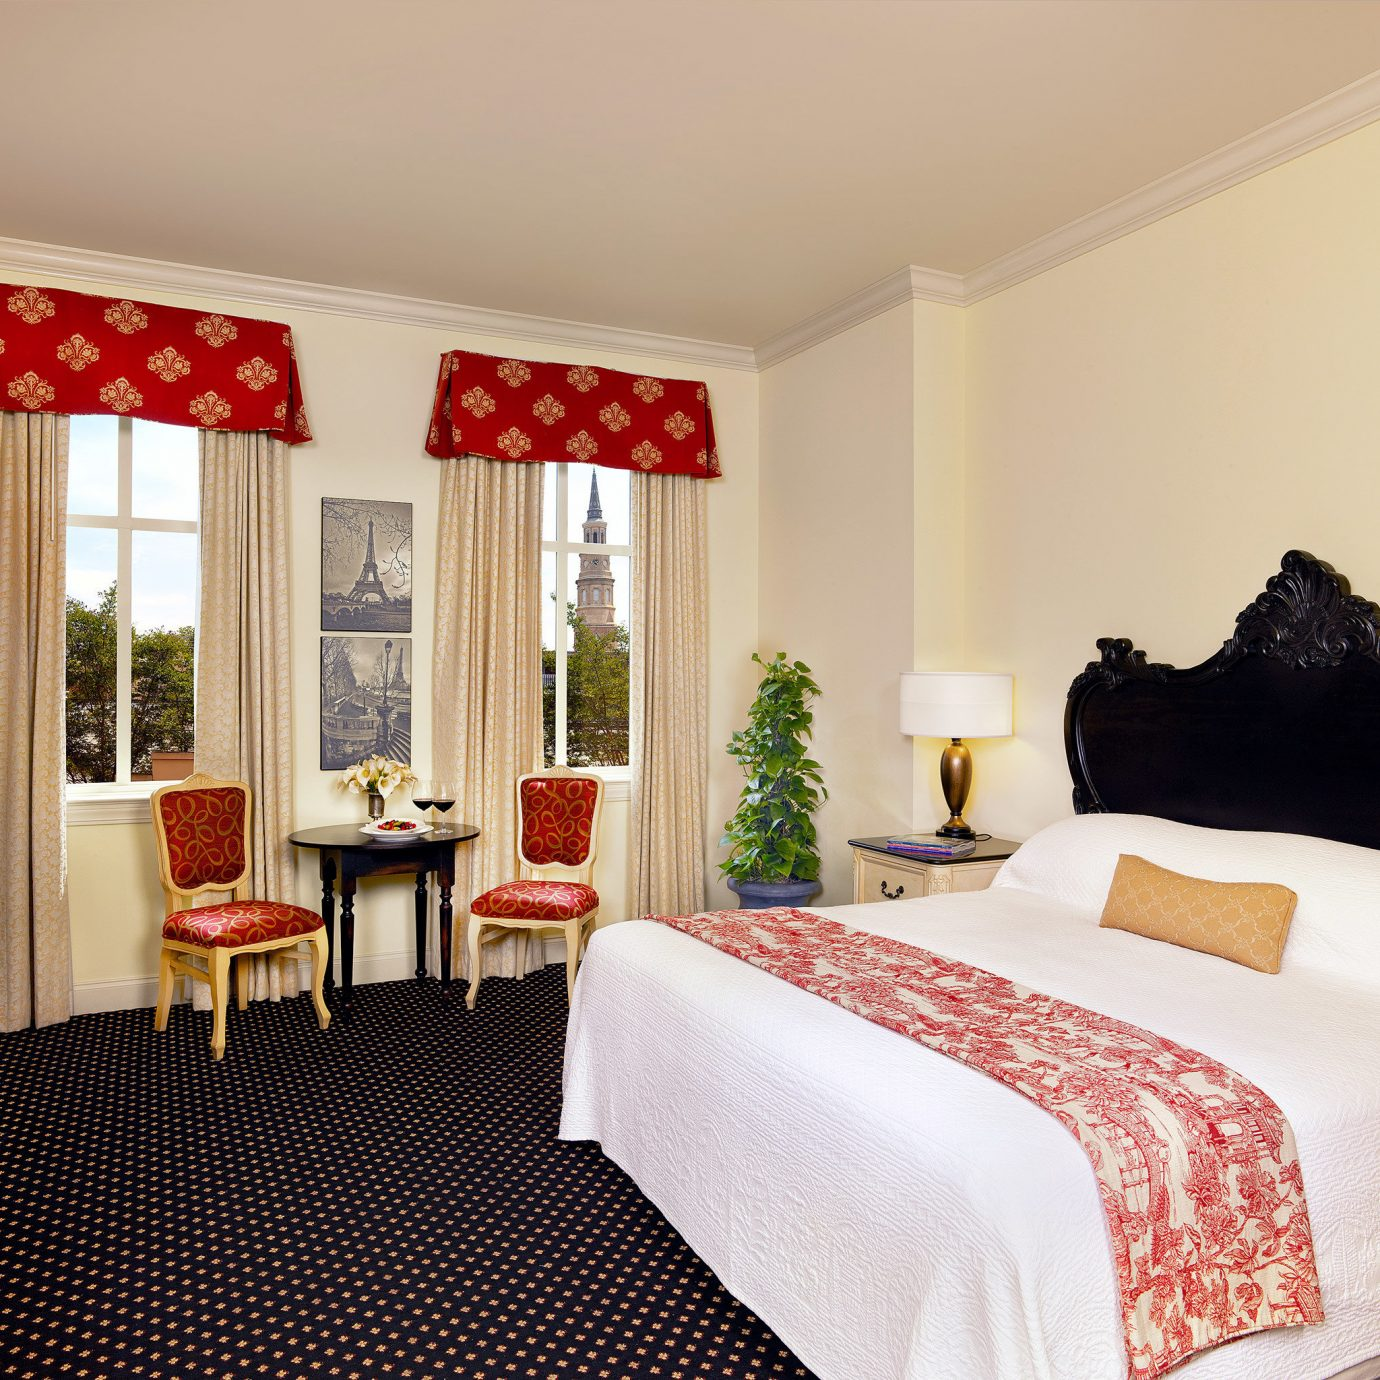 Bedroom Elegant Inn Romantic Scenic views red property Suite cottage bed sheet living room